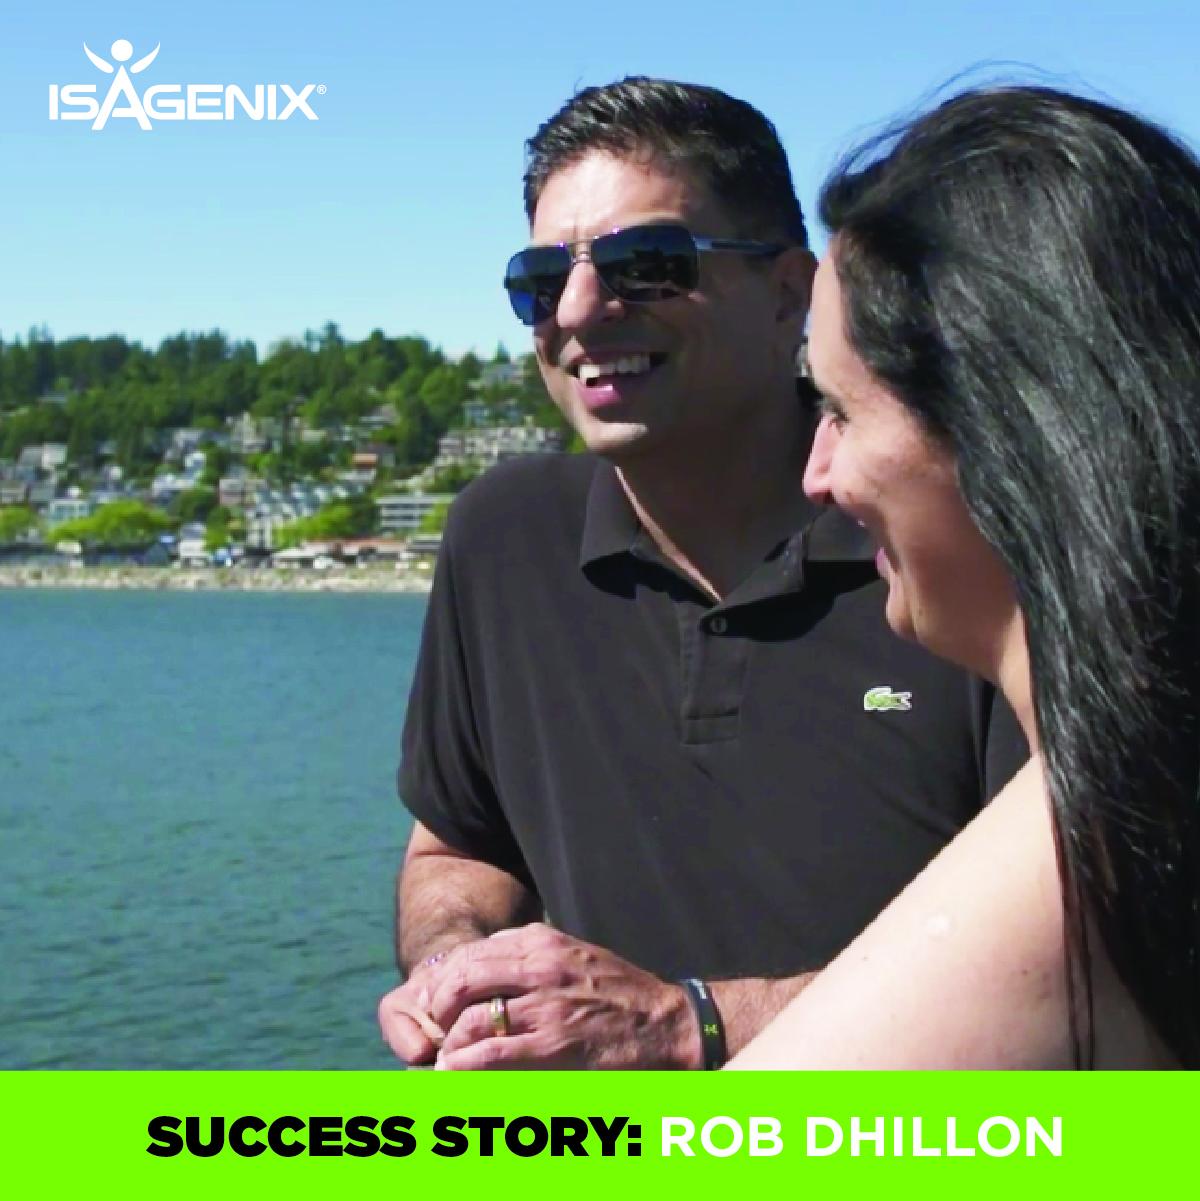 09-22-17_successstory-robdhillon_alesha-1200x1200